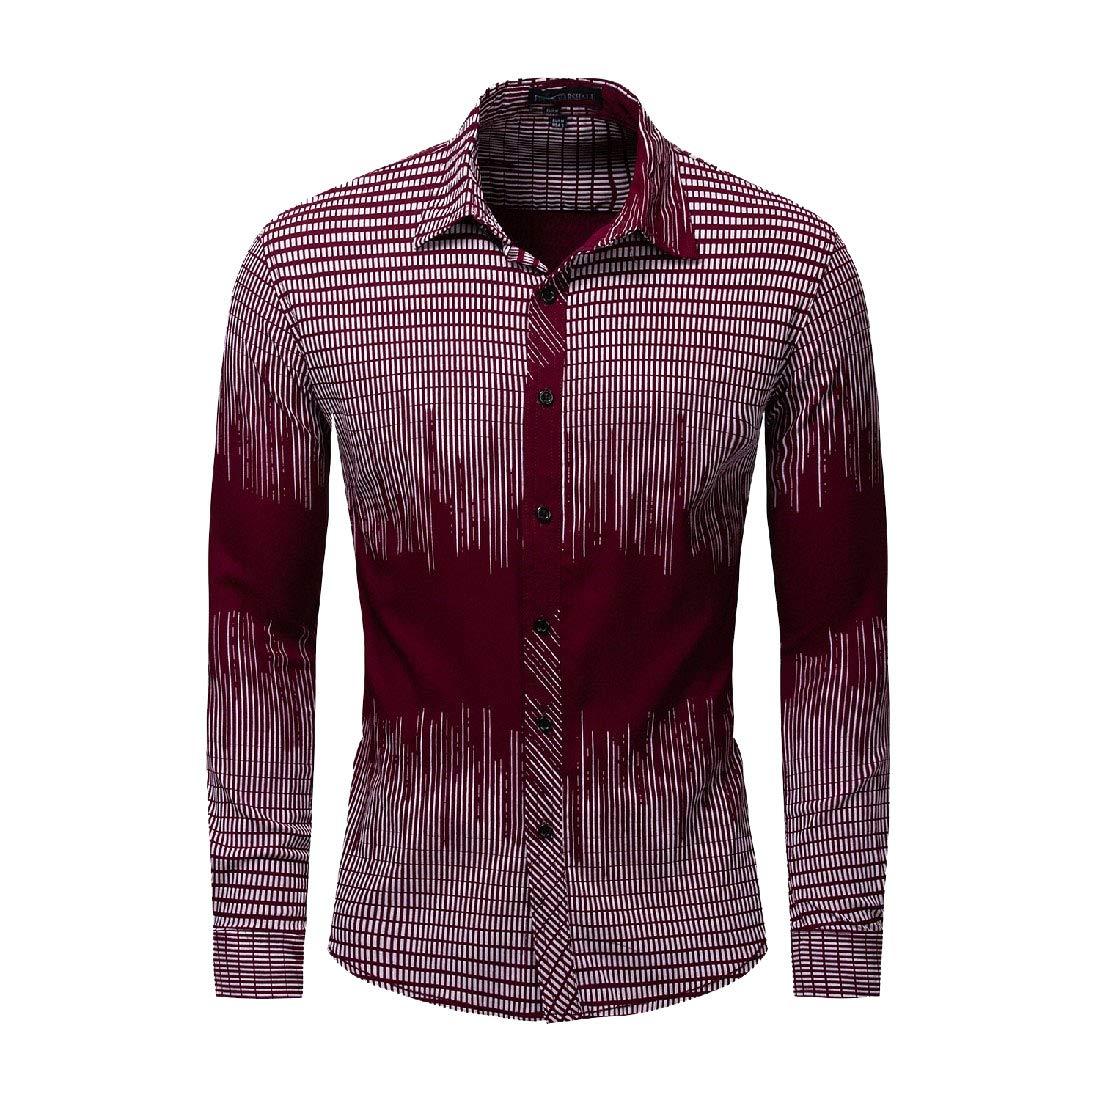 Vska Mens Plaid Long Sleeve Stretch Plus-Size Button Down Cotton Shirt